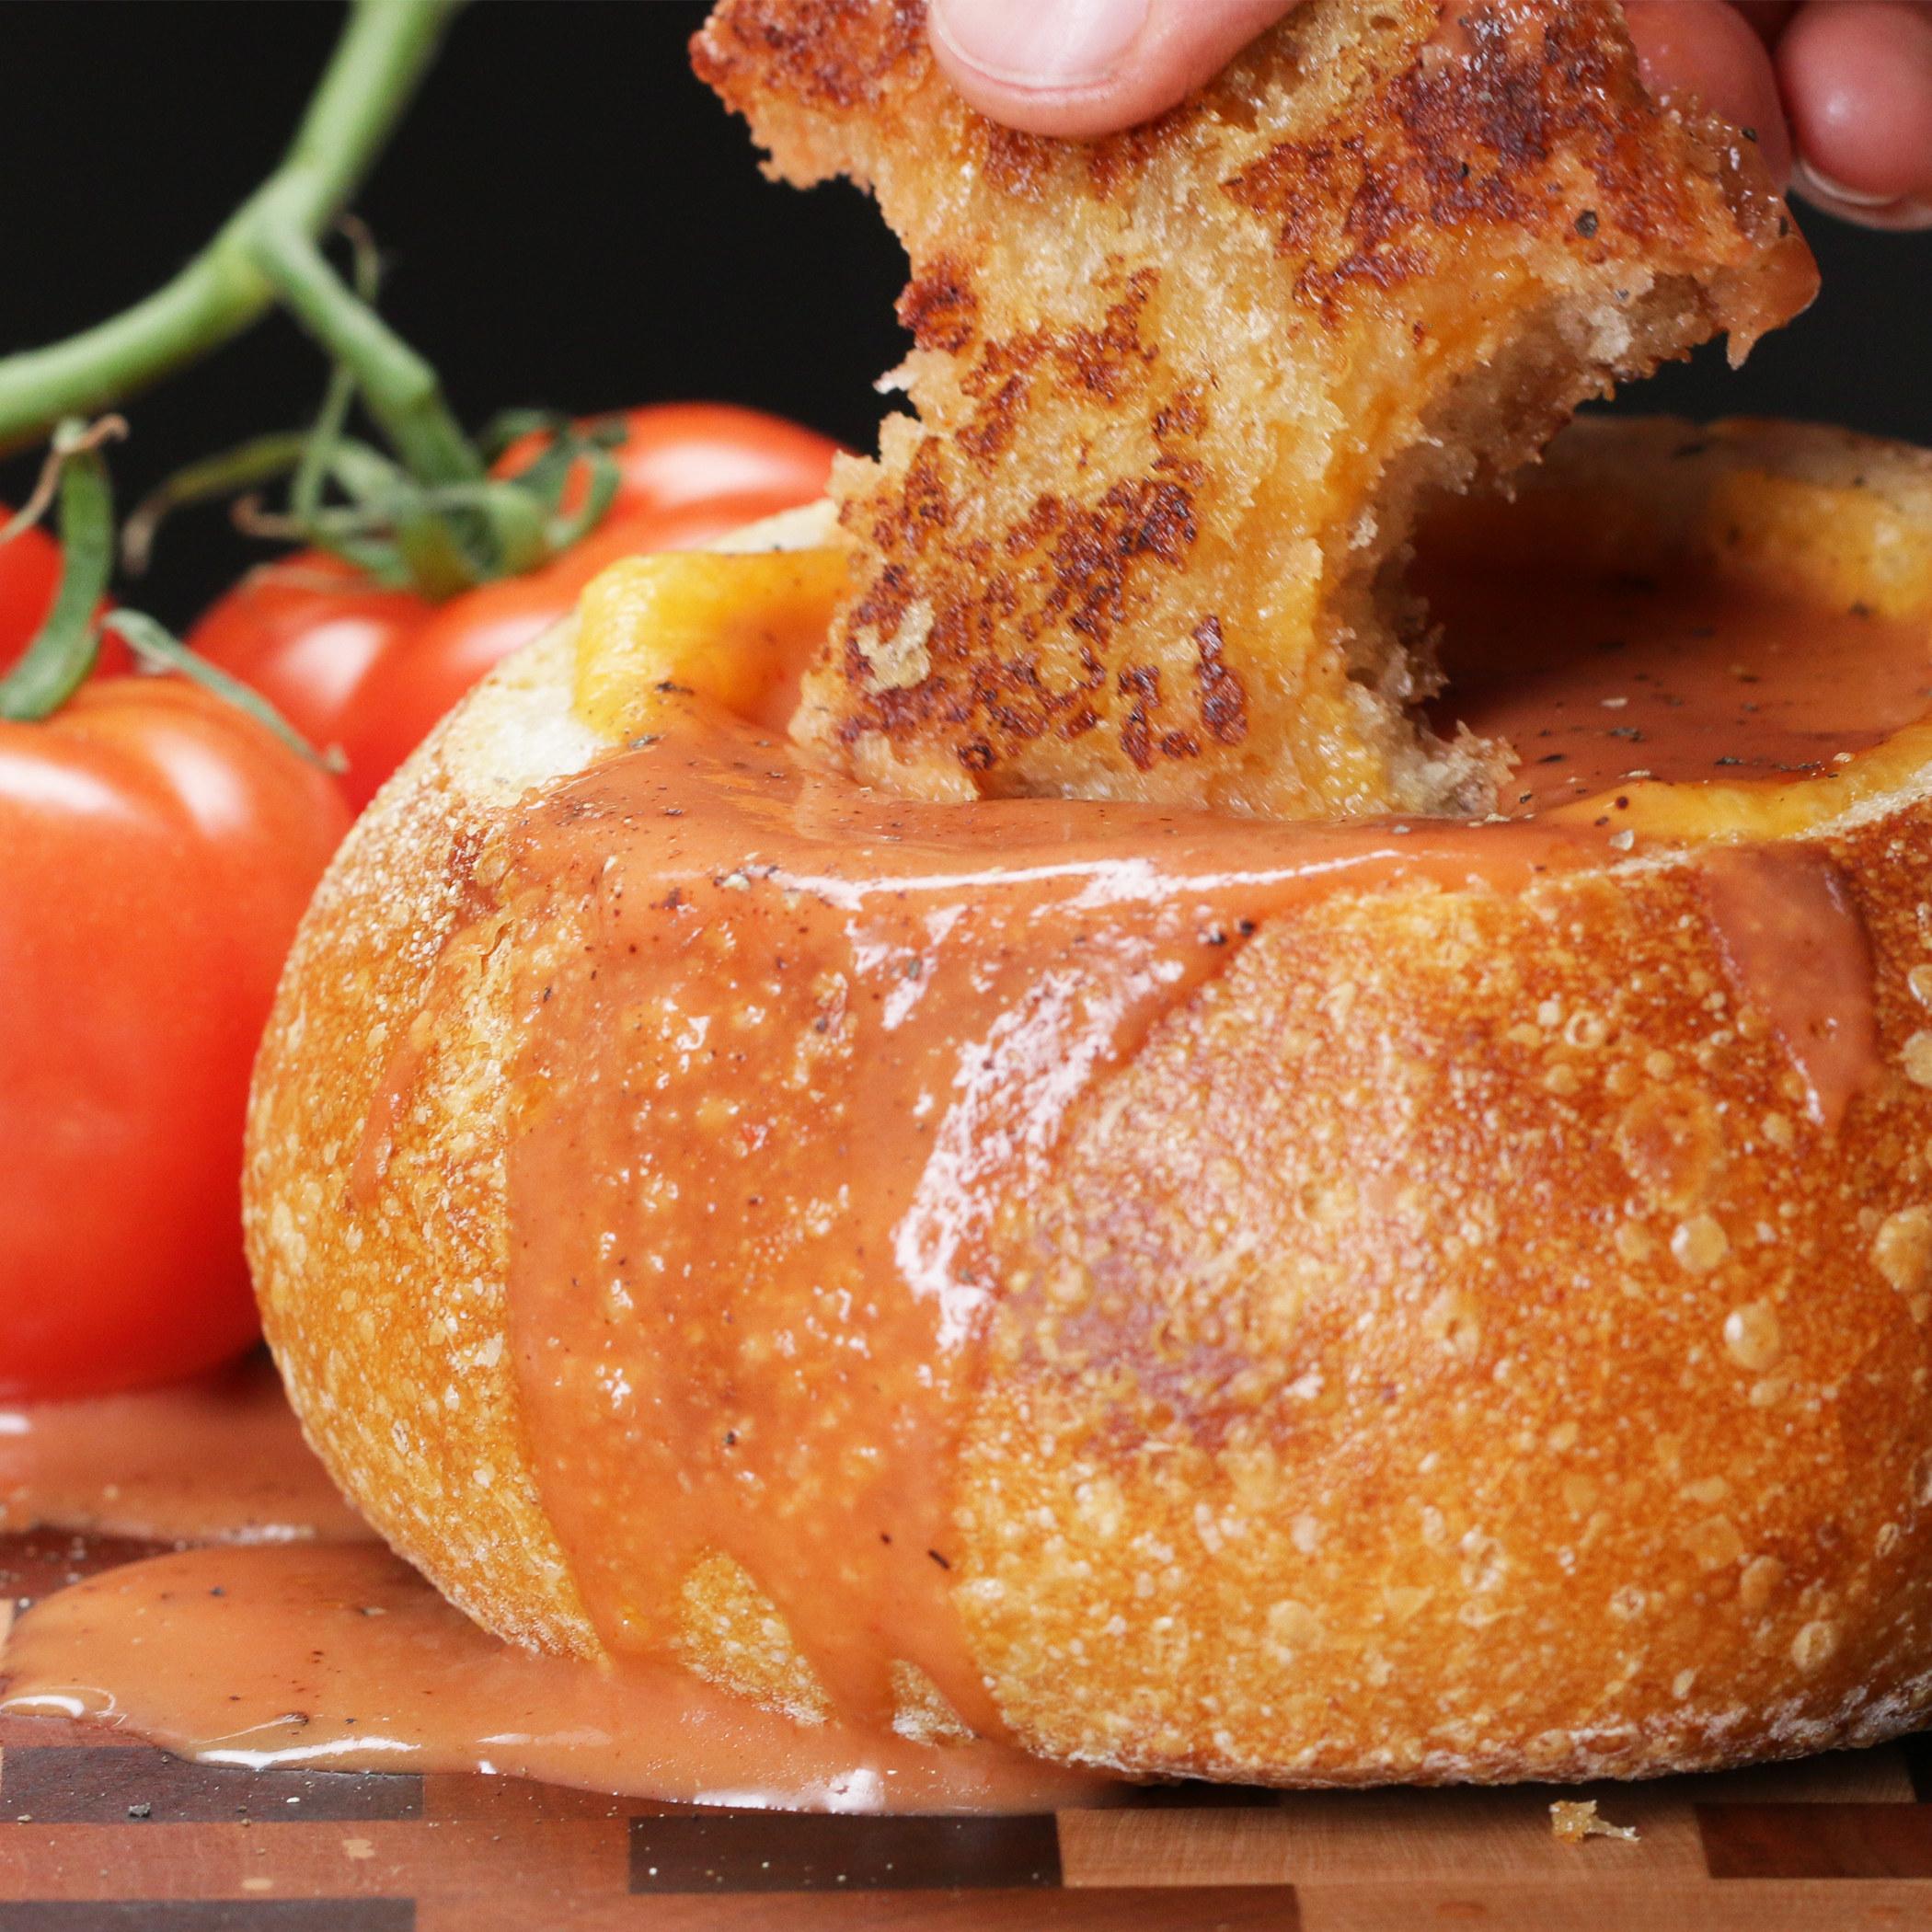 Bread bowl full of tomato soup